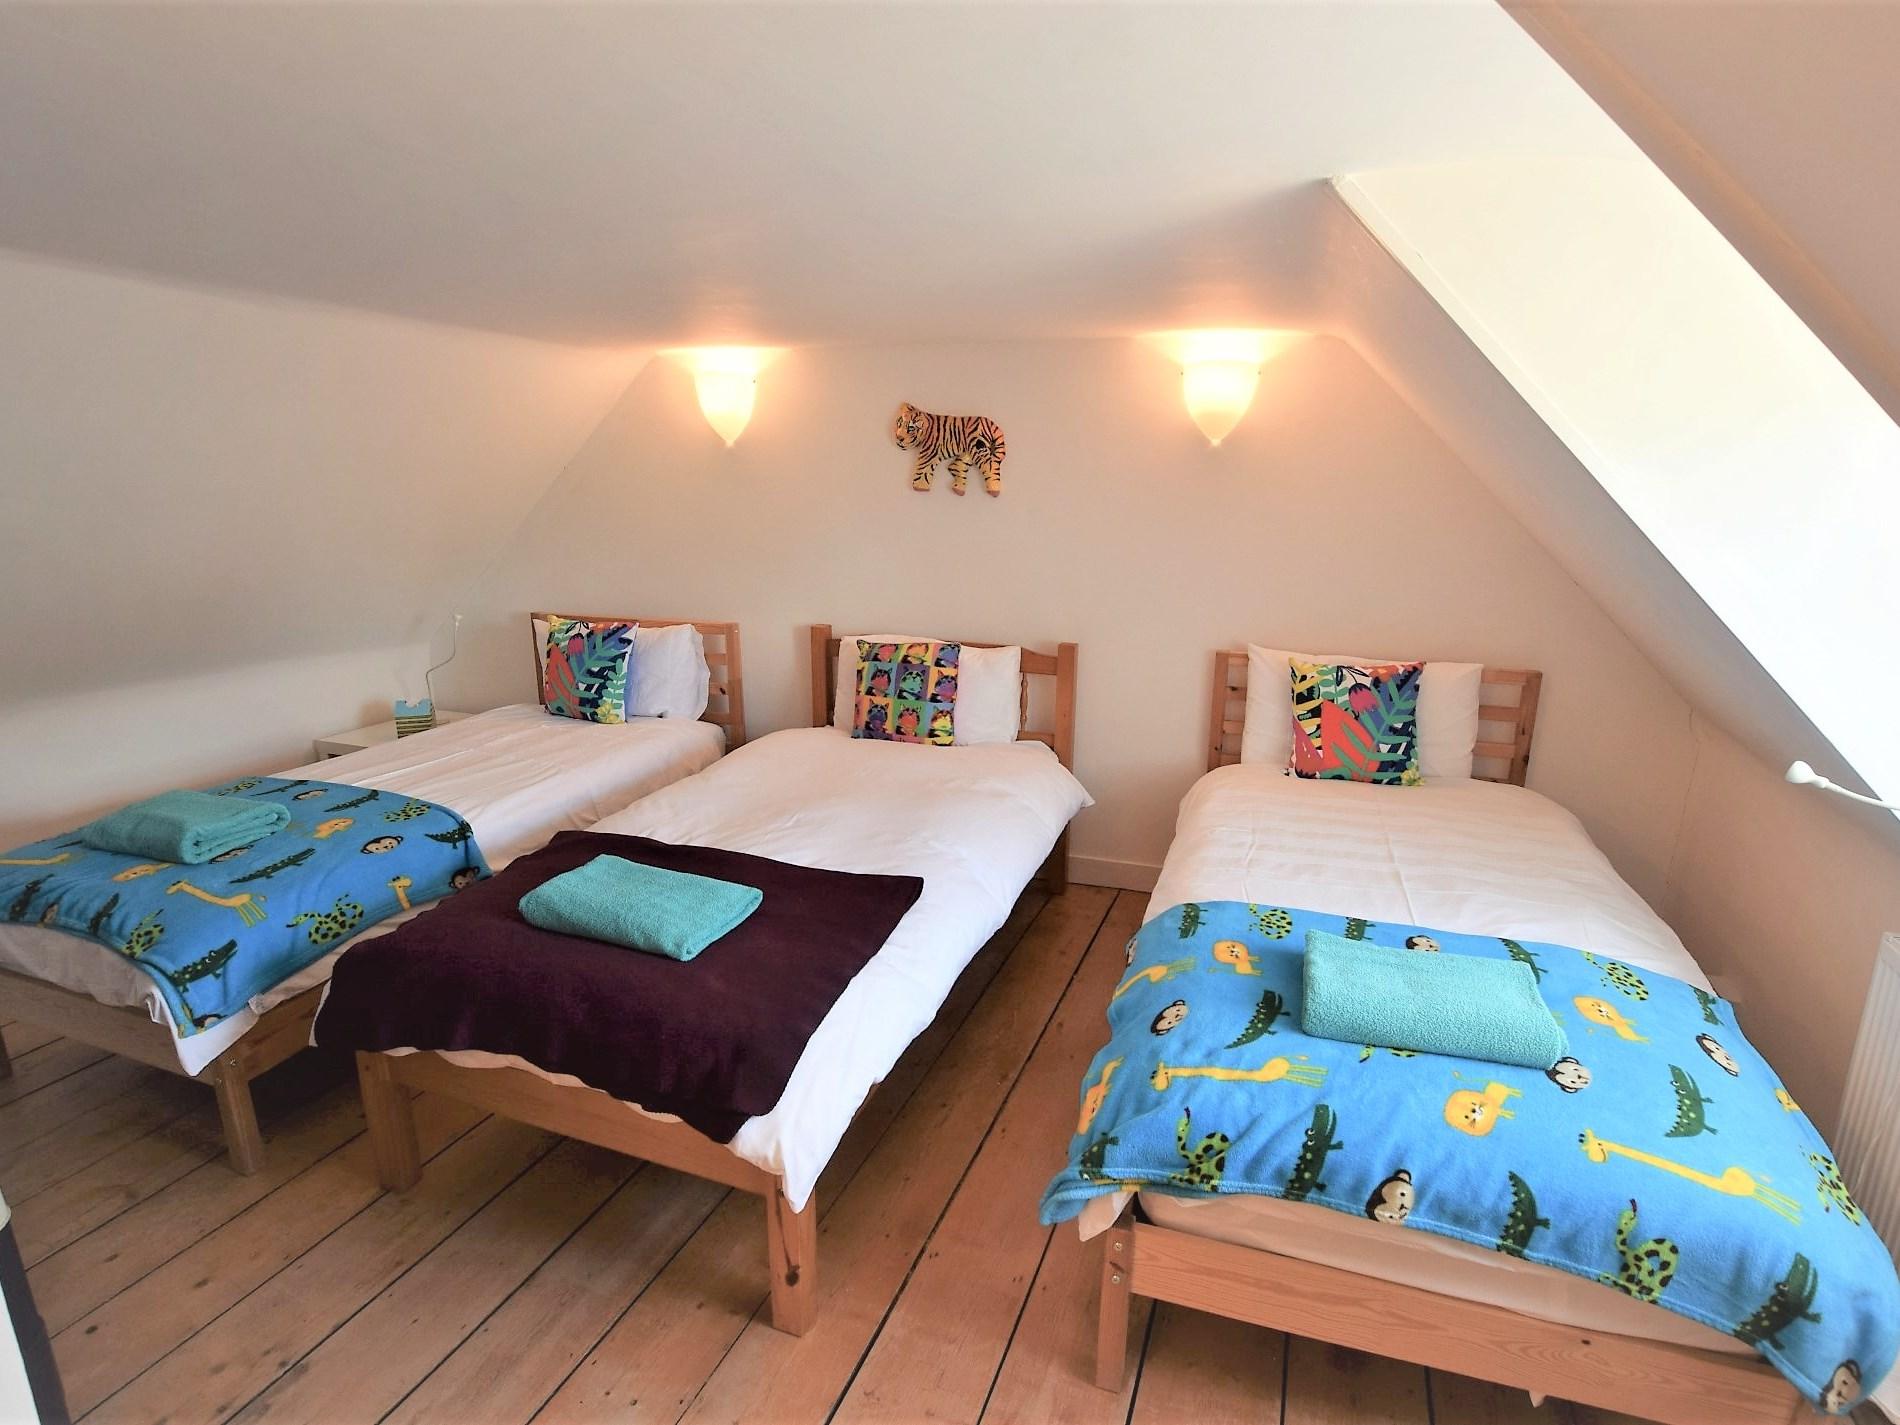 Childrens loft room